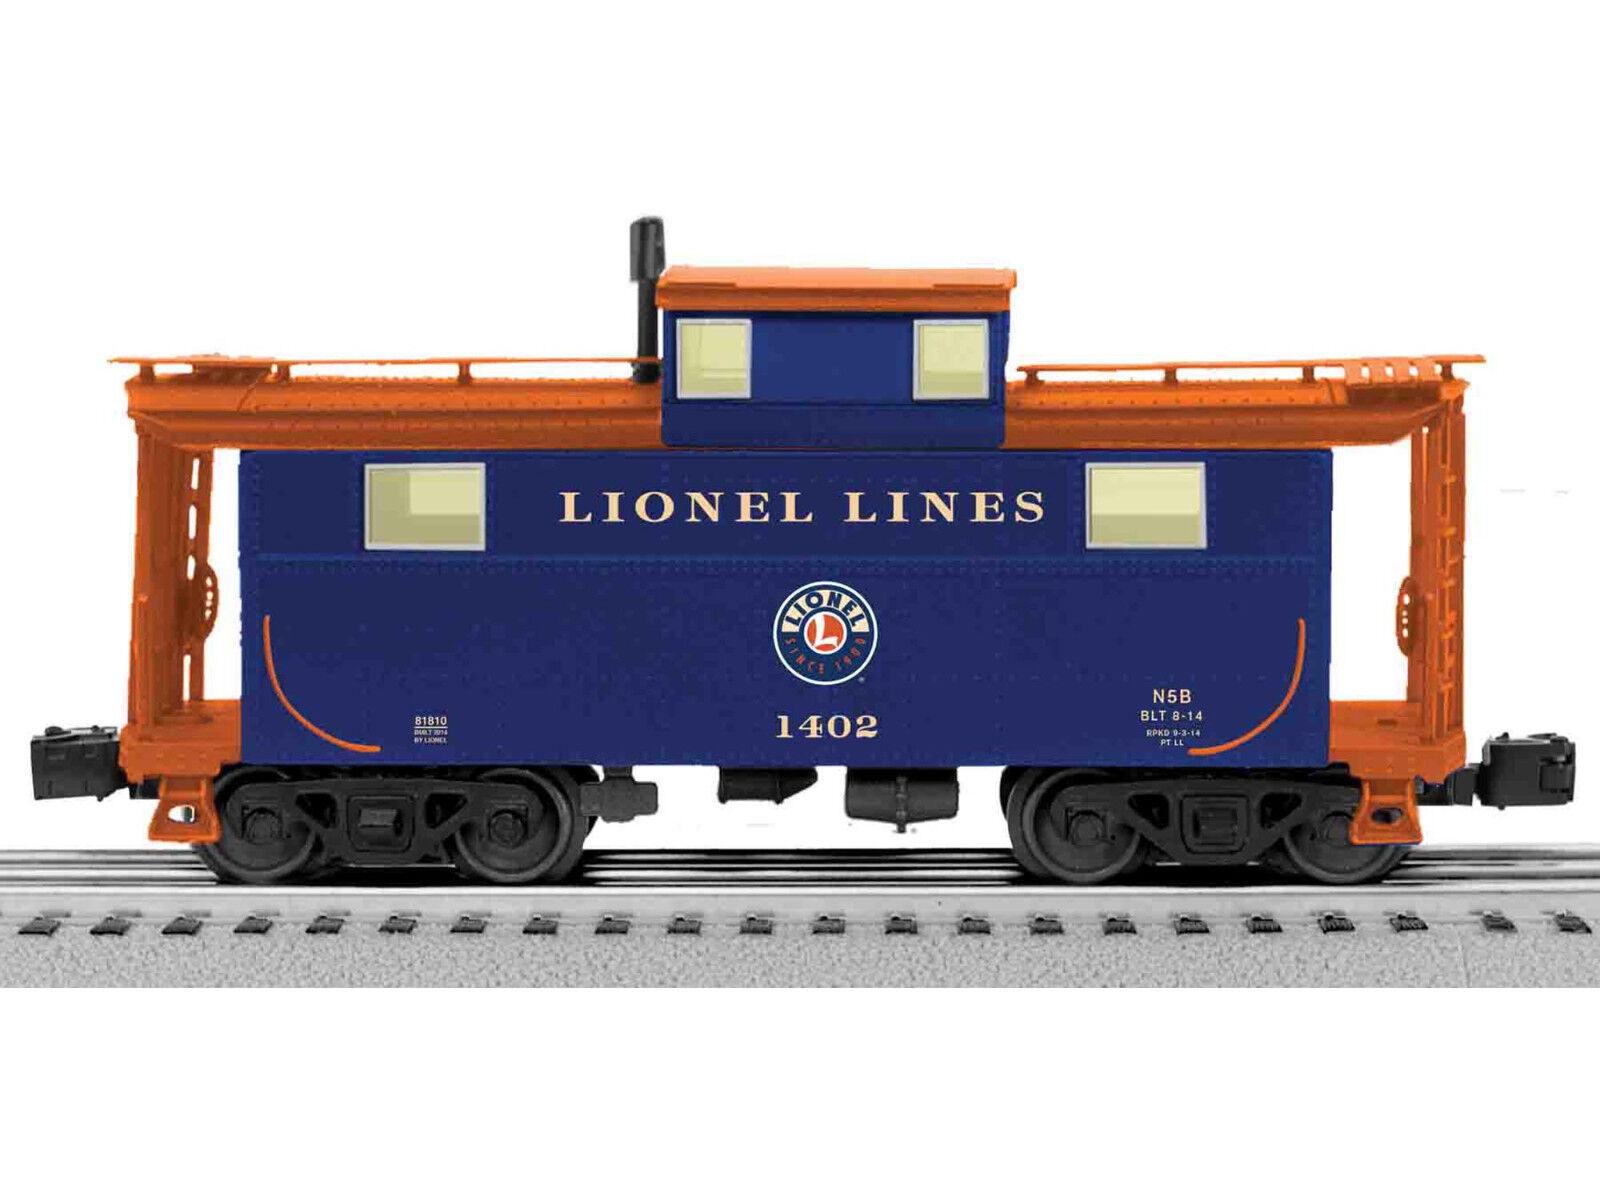 Lionel  81810 Lionel Lines  N5B Caboose